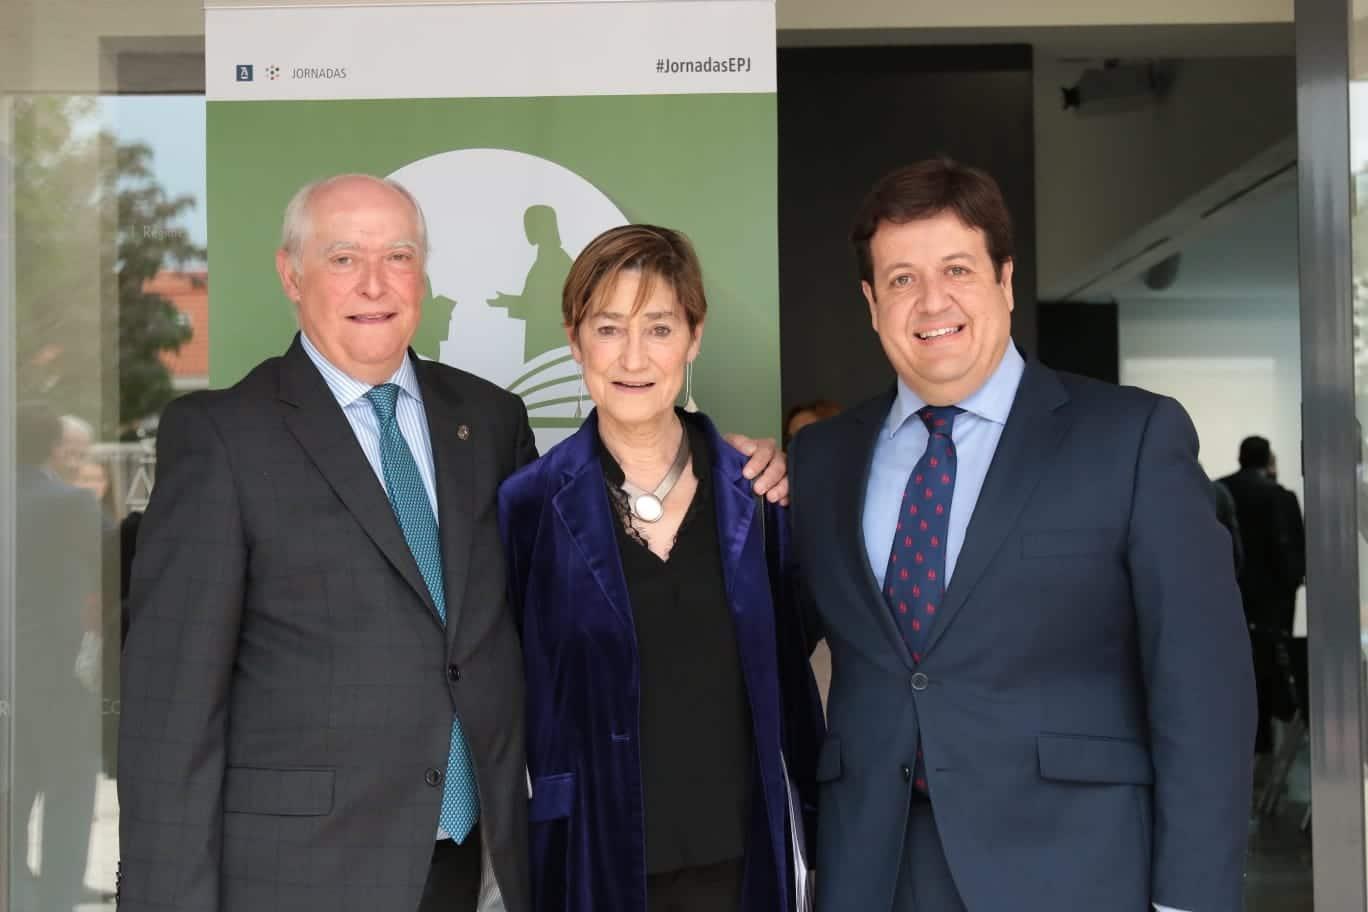 https://blog.globalcaja.es/wp-content/uploads/2018/05/IMG-20180525-WA0001.jpg